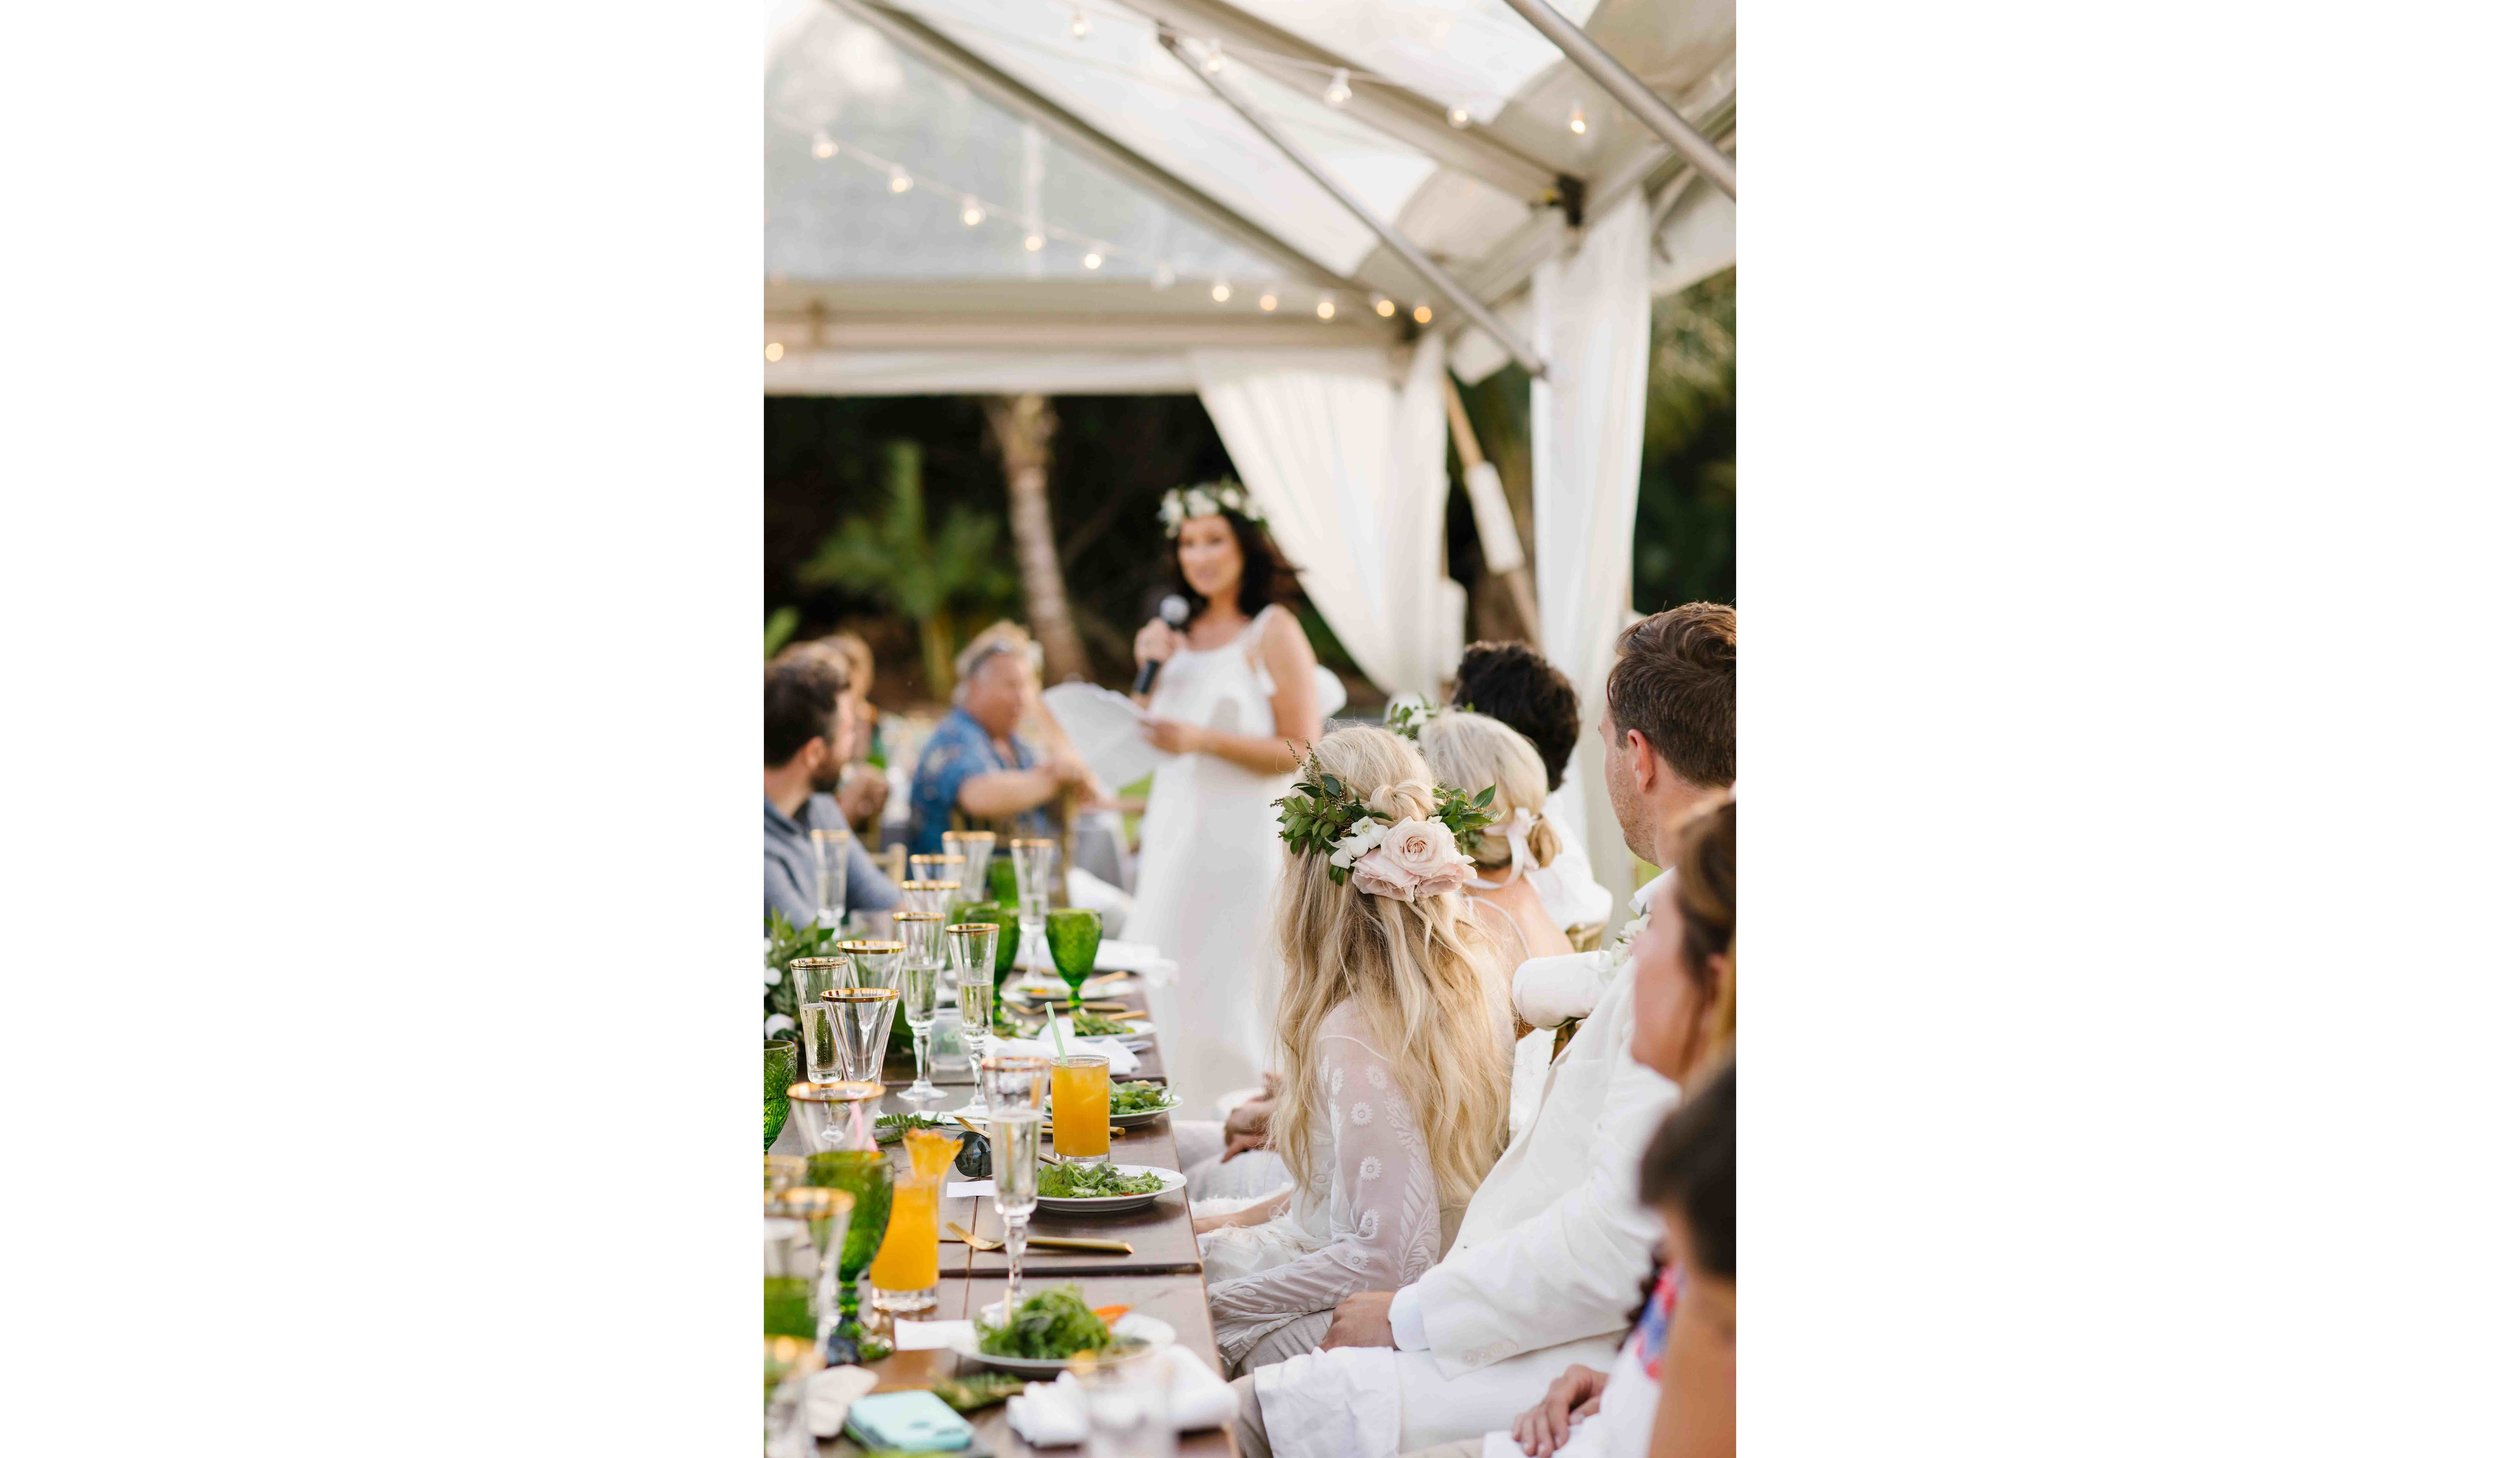 Bridesmaid's Speech During Wedding Reception